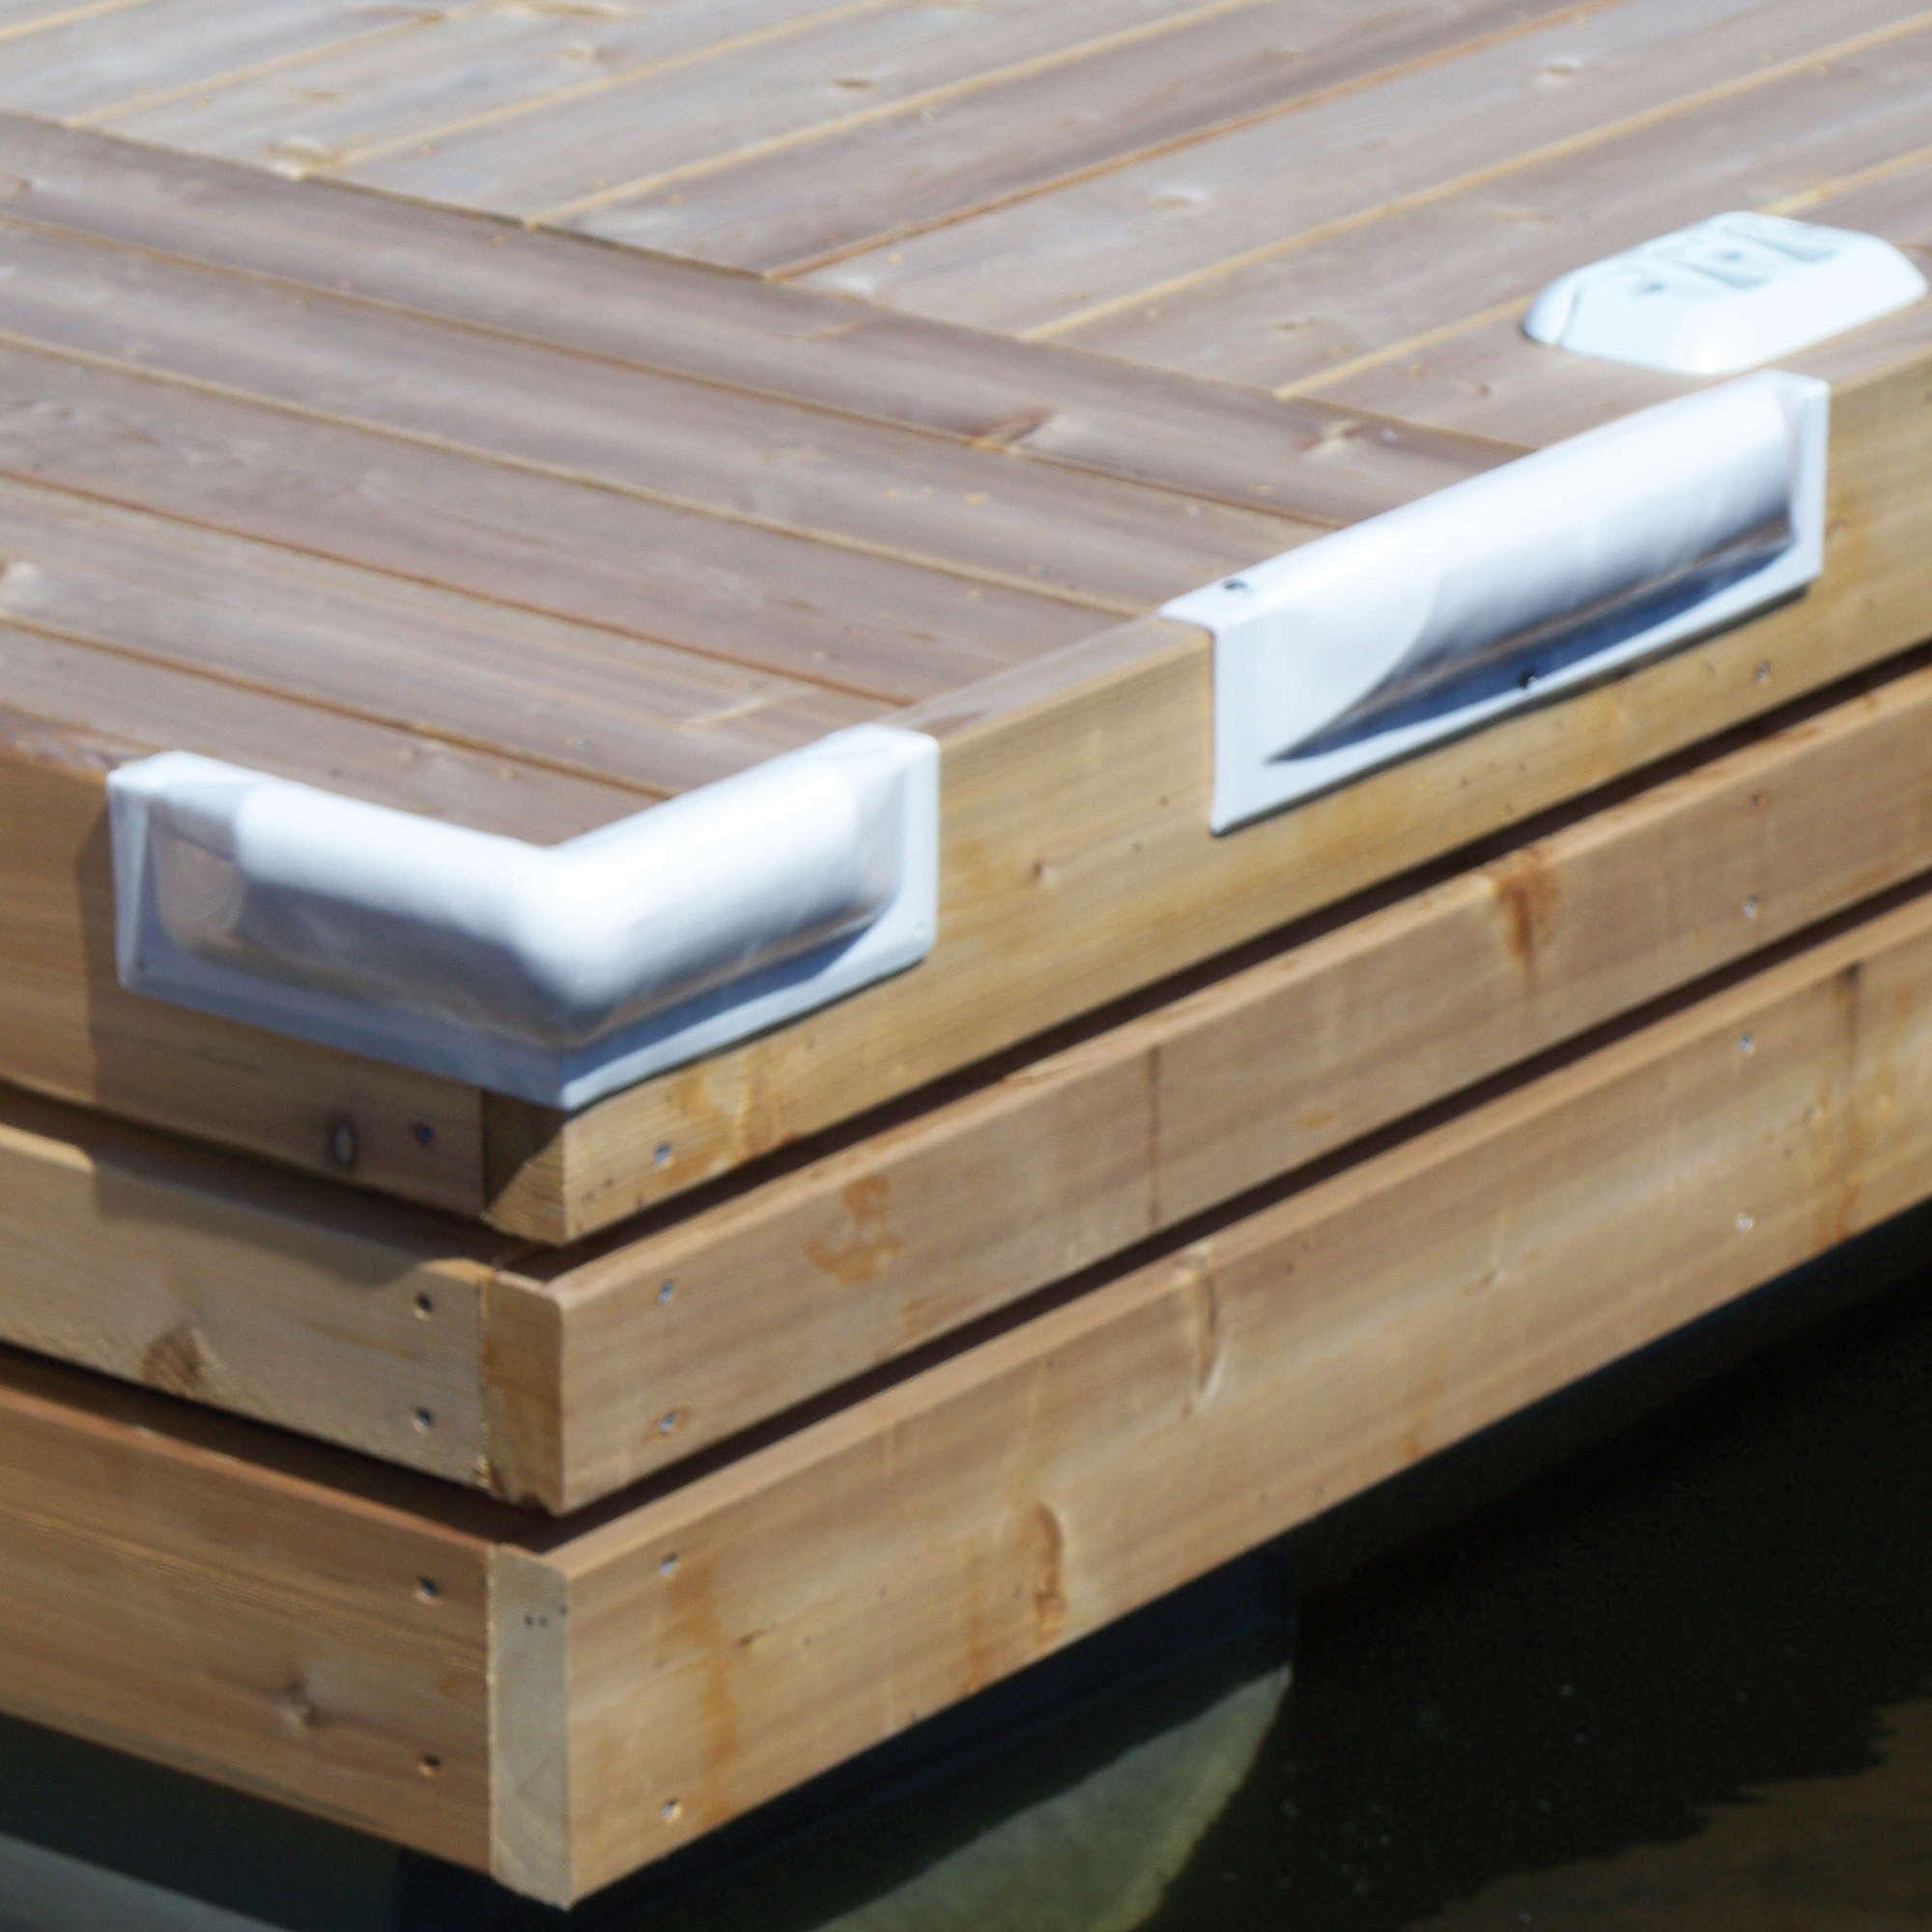 Taylor Made Dock Pro 4-Pack Bumper Kit